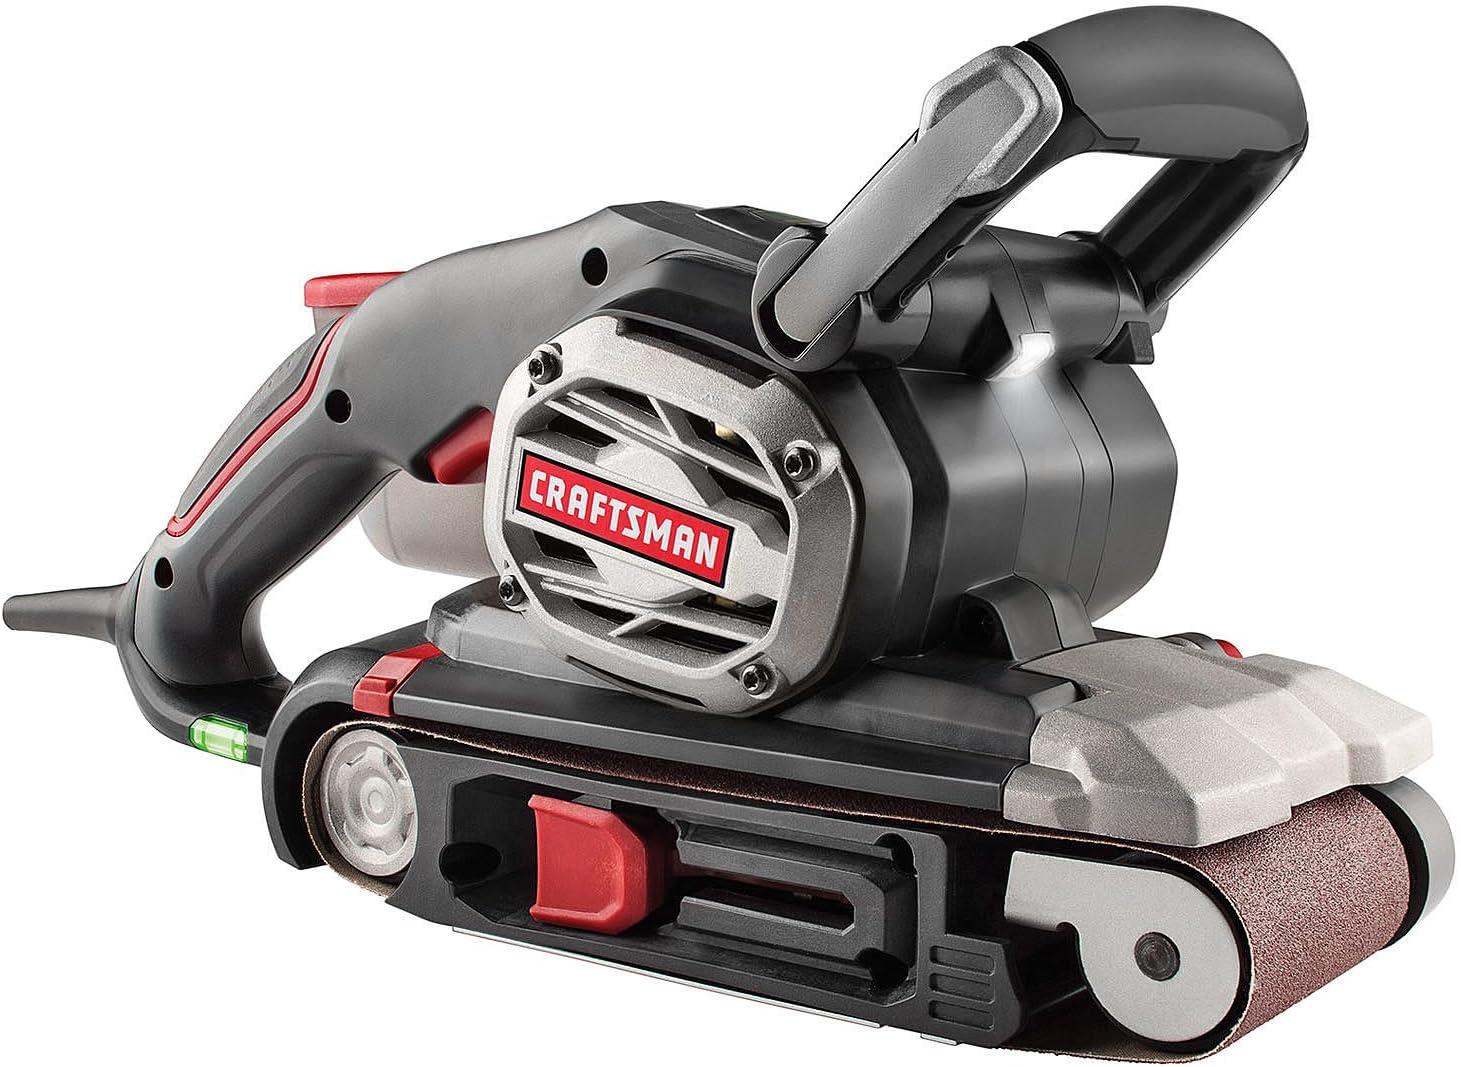 Craftsman 8A 3X21 BELT SANDER